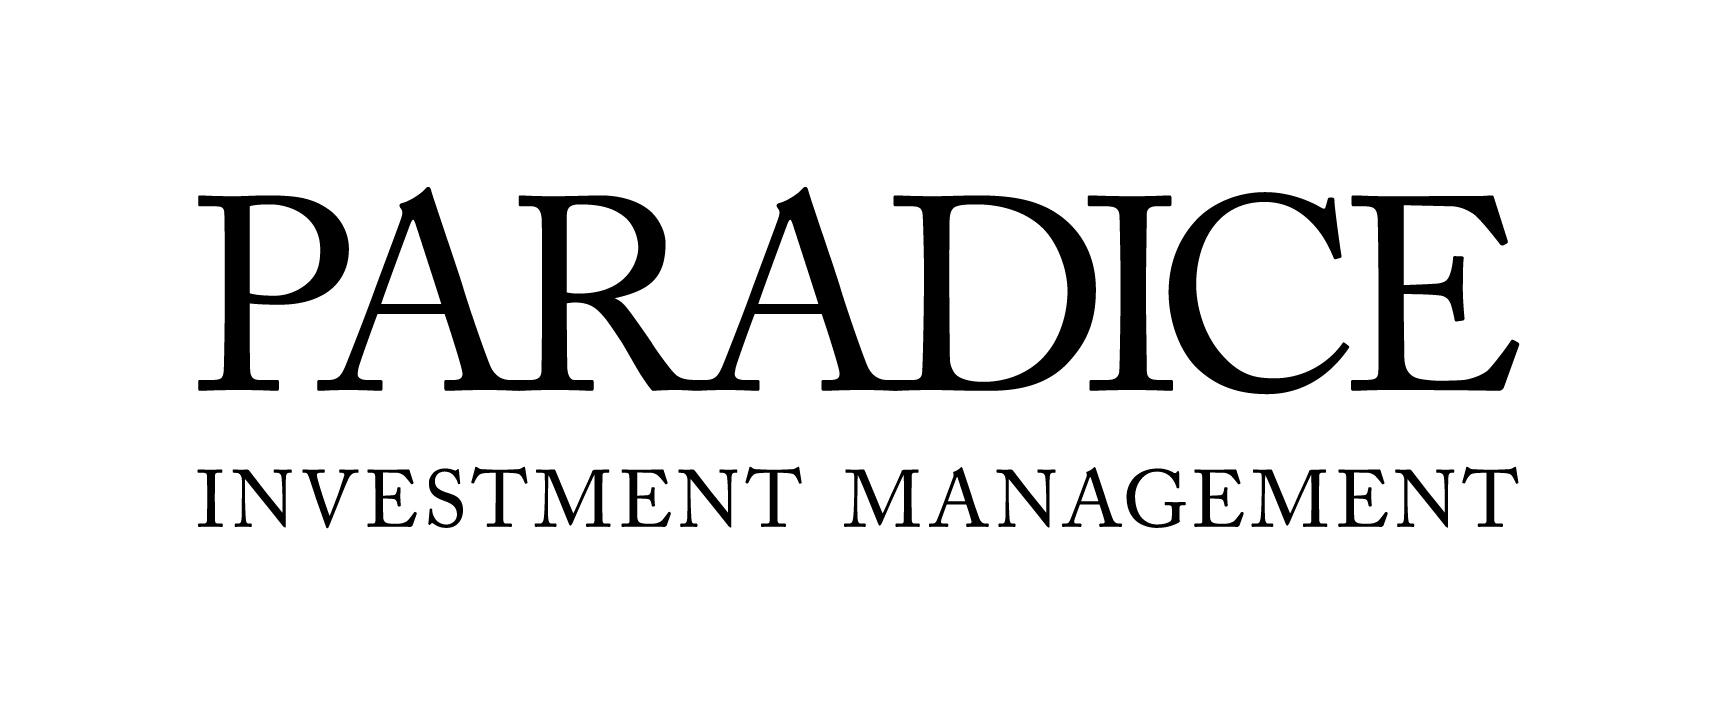 Paradice Investment Management Pty Ltd (Australia)